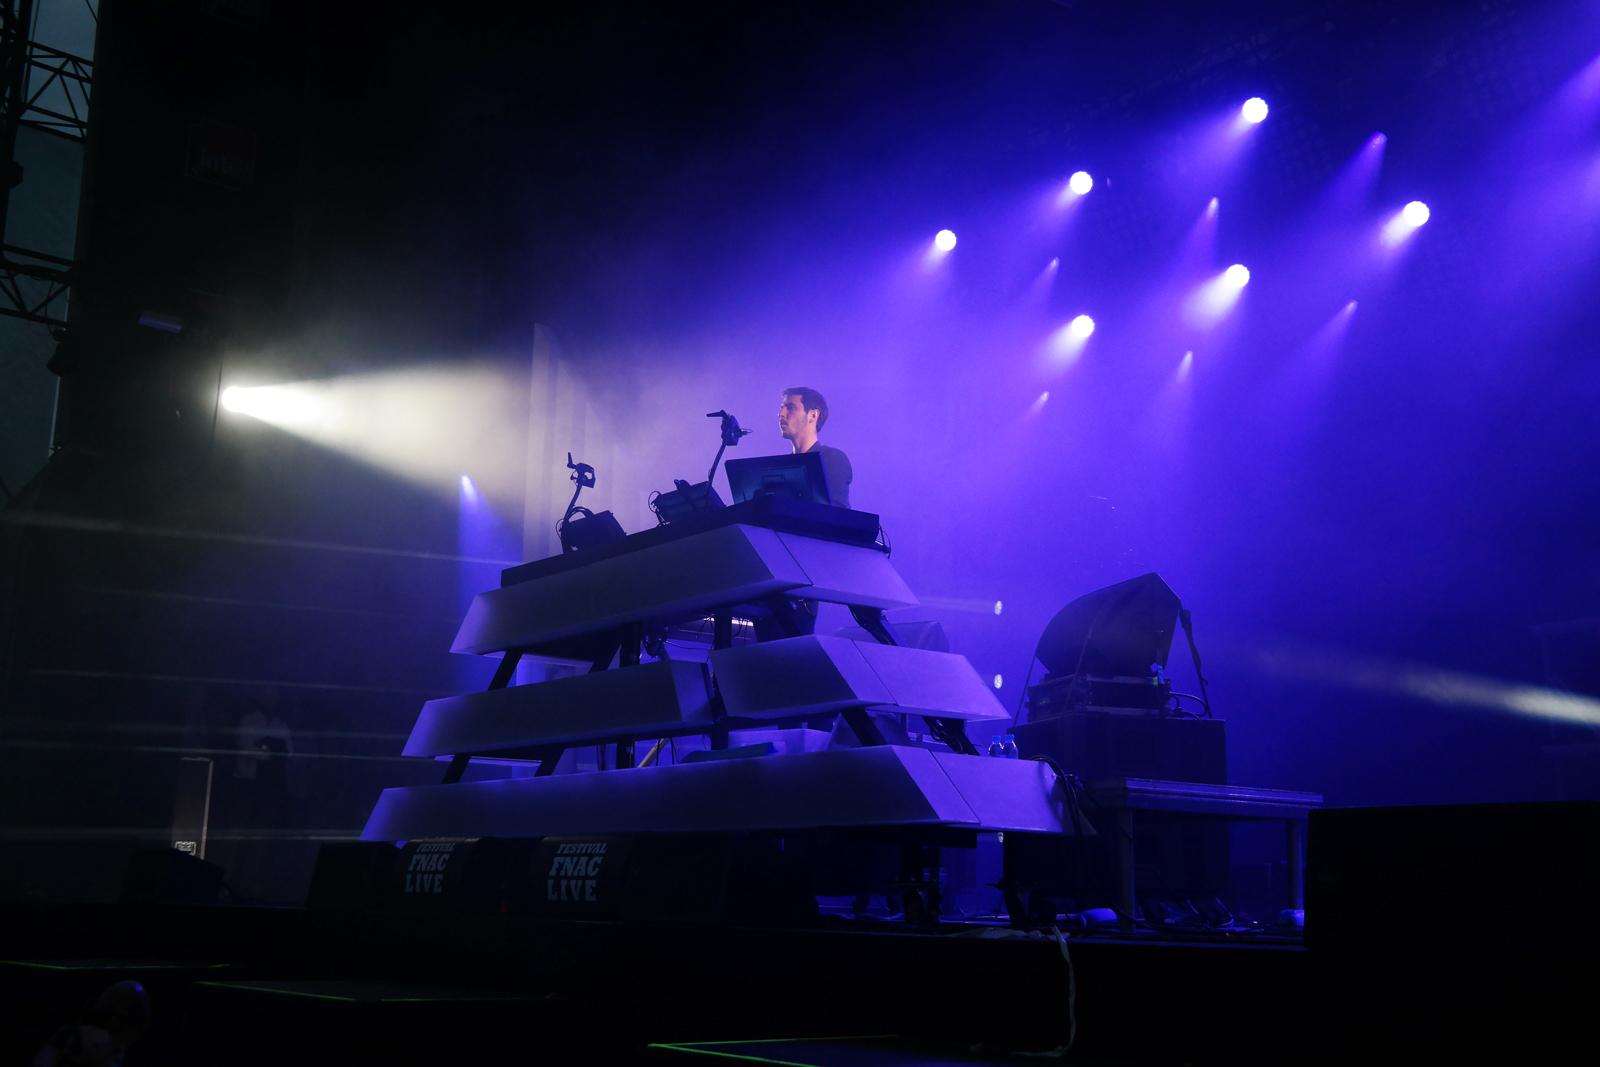 The-Avener-fnaclive-2015-festival-concert-live-dj-set-Tristan-Casara-tournée-The-wanderings-of-the-avener-tour-blue-stage-photo-scène-by-united-states-of-paris-blog